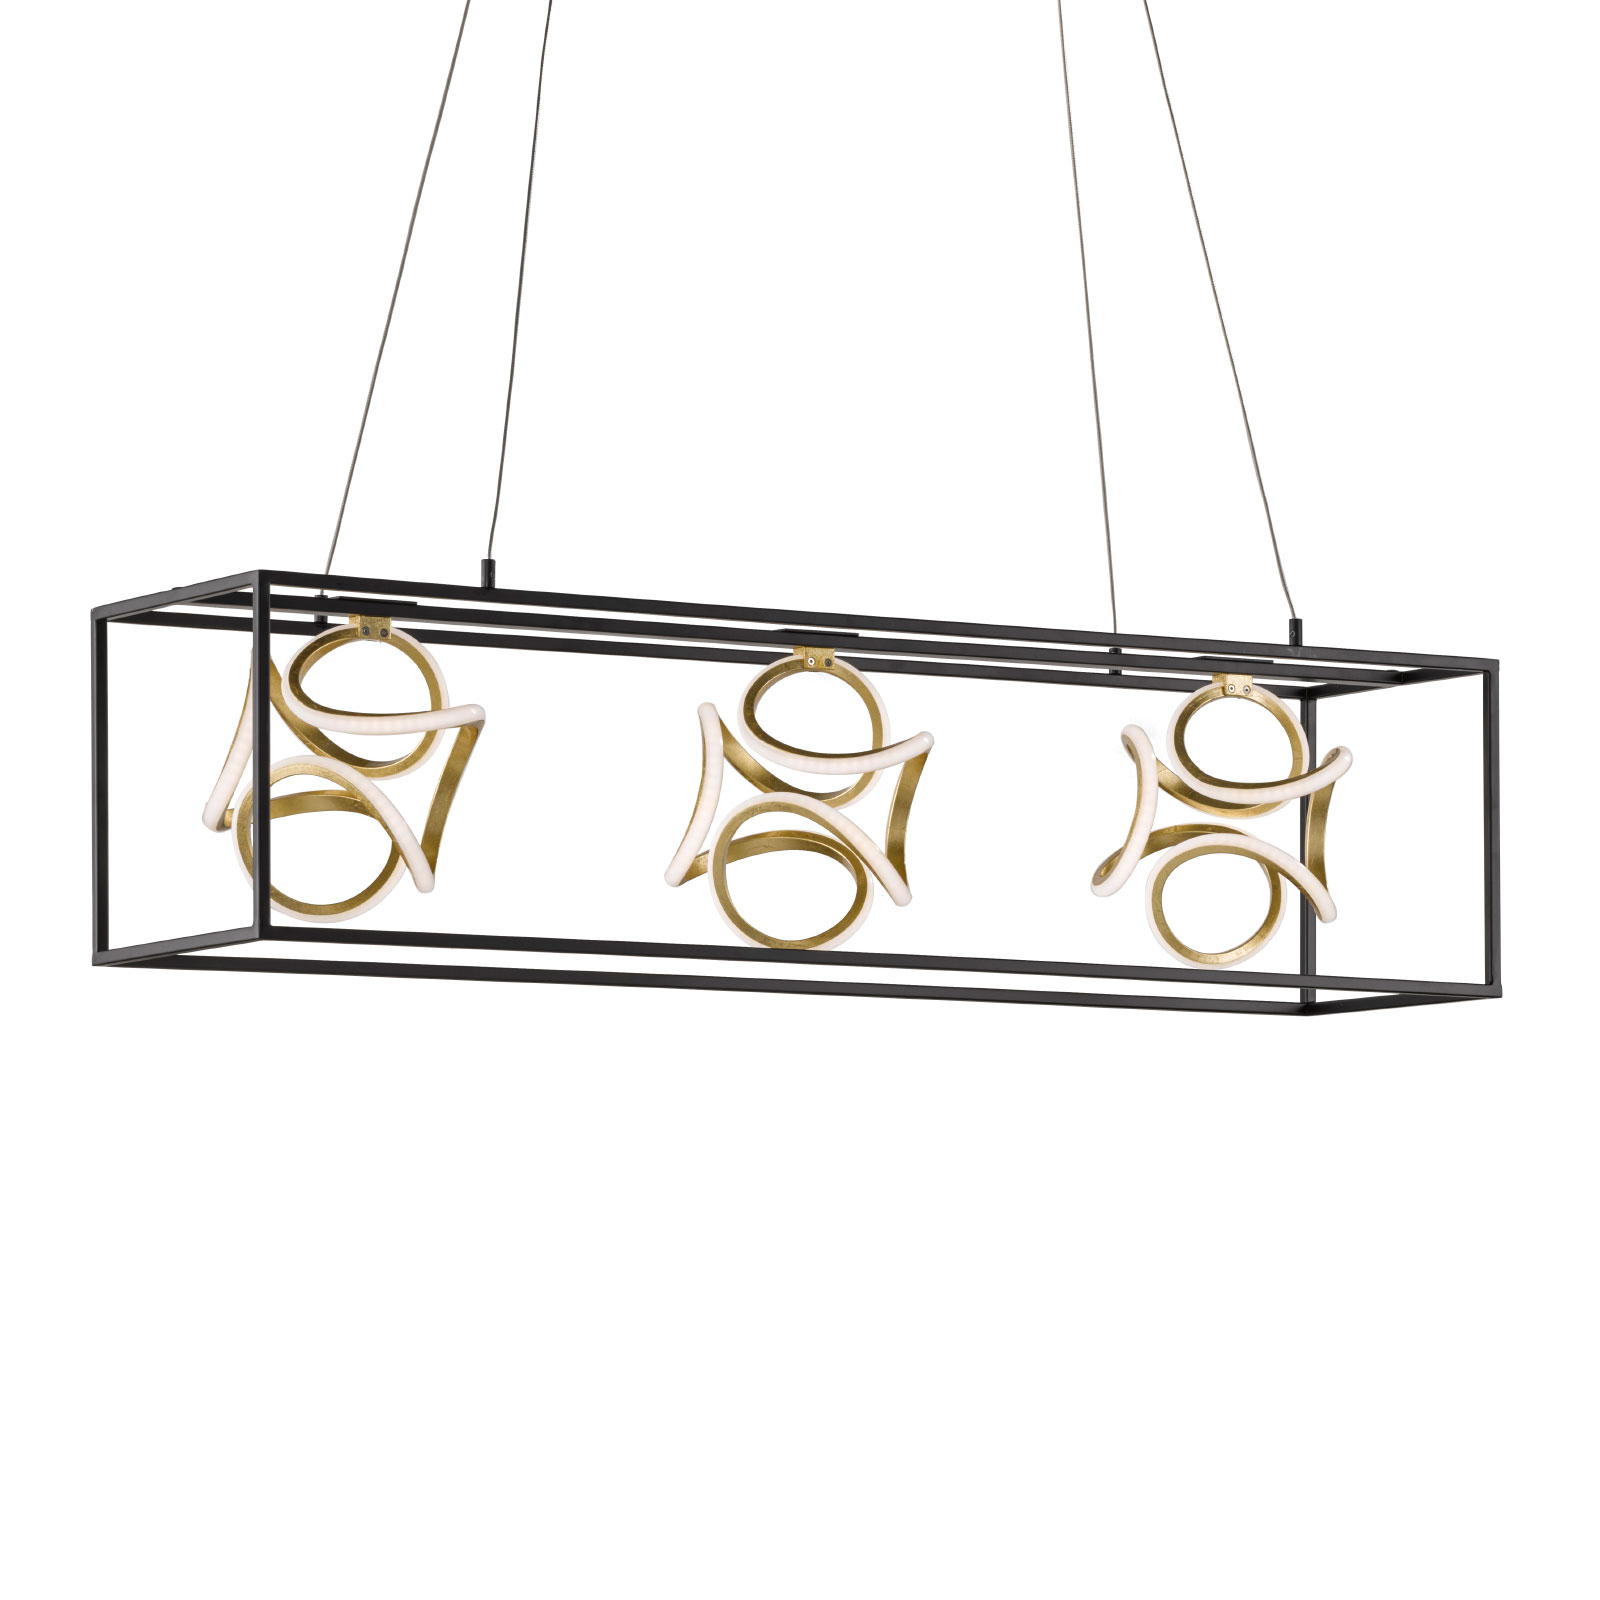 Suspension LED Gesa avec cage métallique